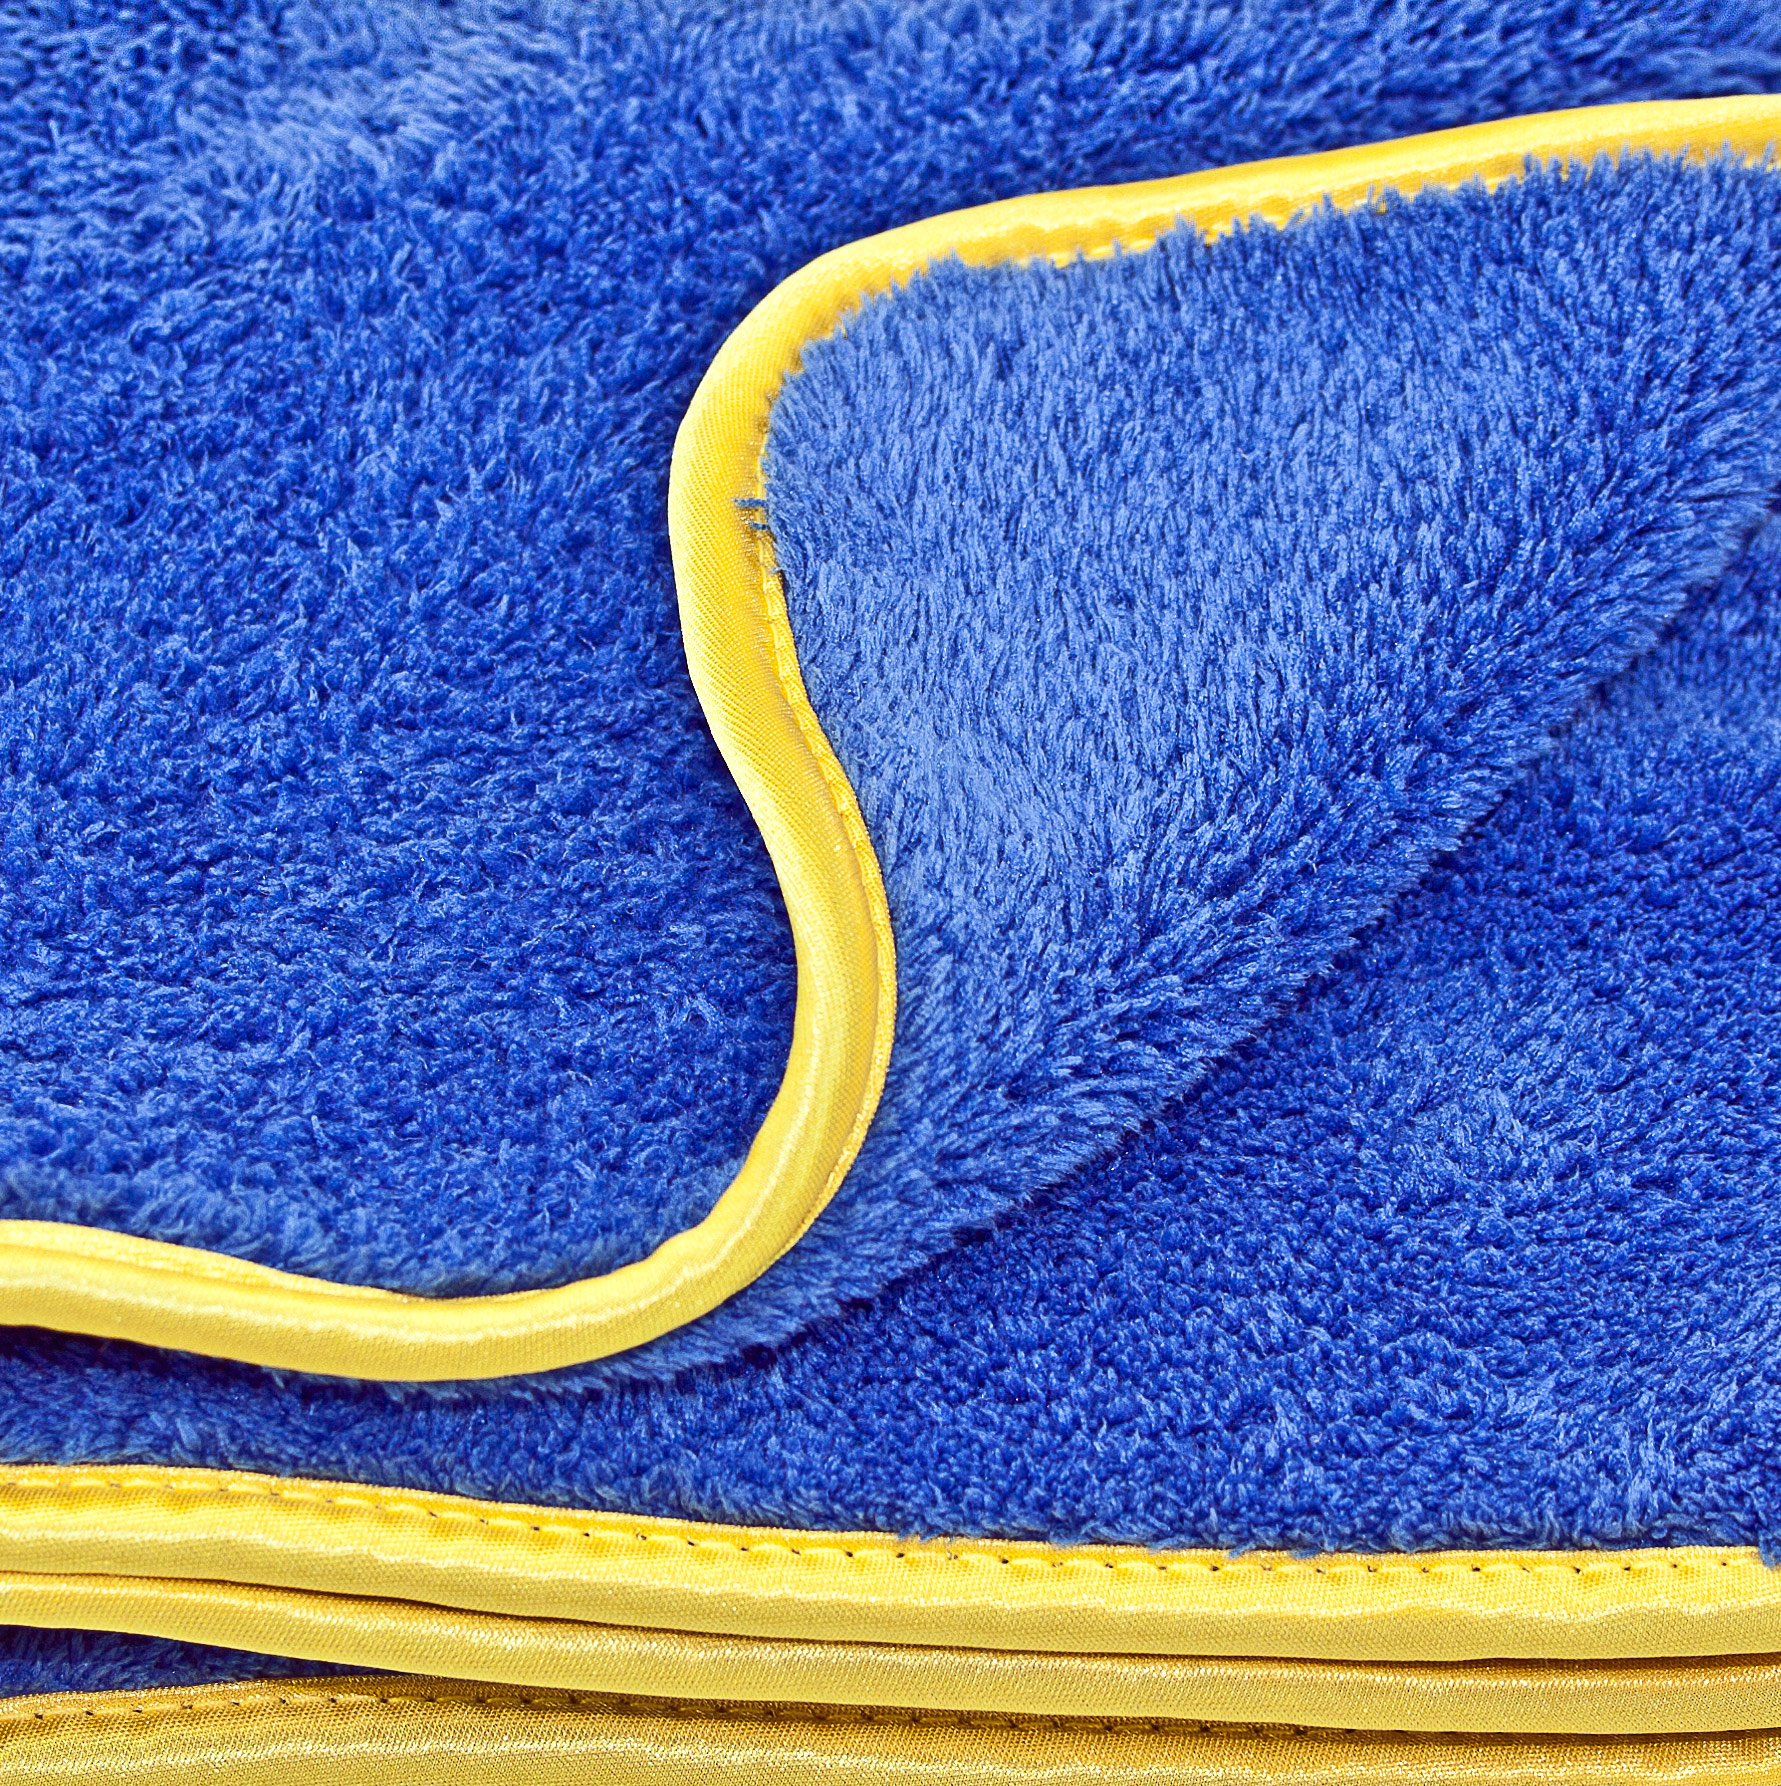 Microfaser Detailingtücher, Microfasertuch Doppelpack, Petzoldts